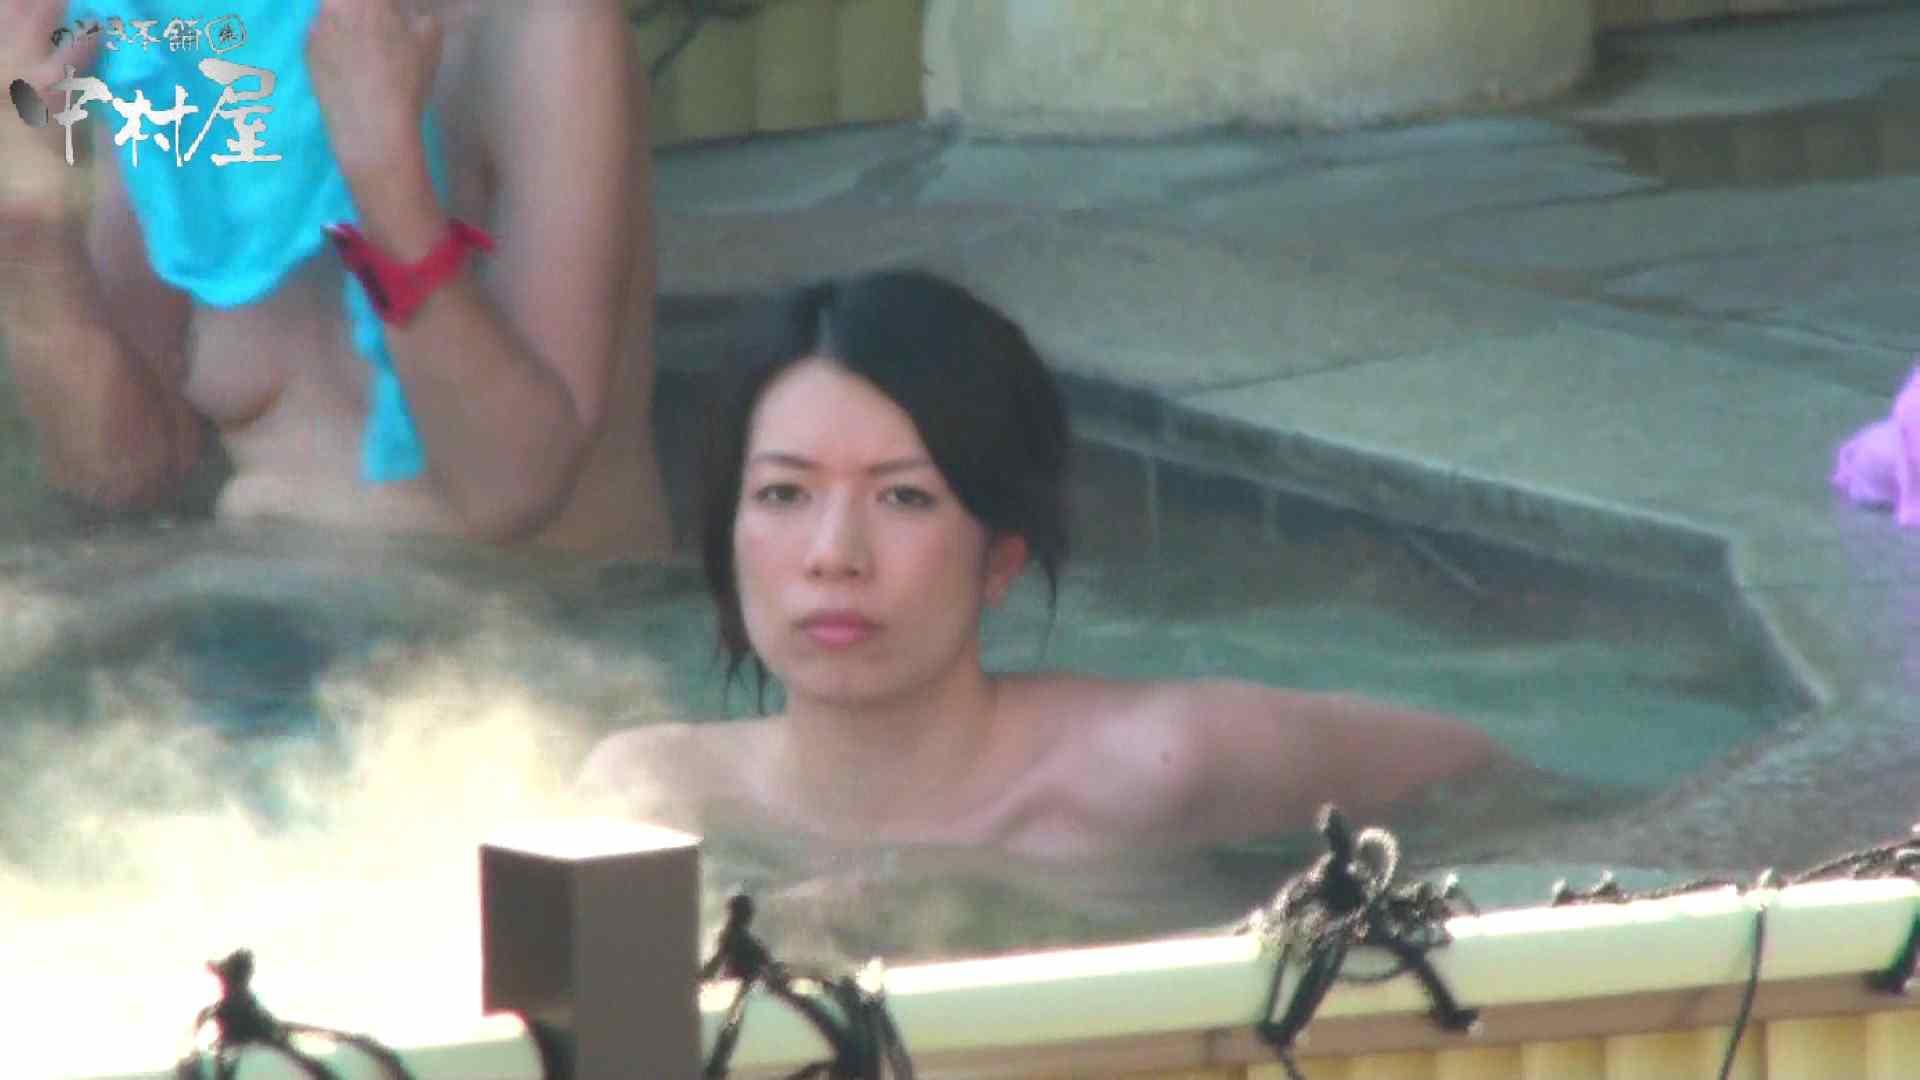 Aquaな露天風呂Vol.919 OLのエロ生活   露天風呂  91連発 70